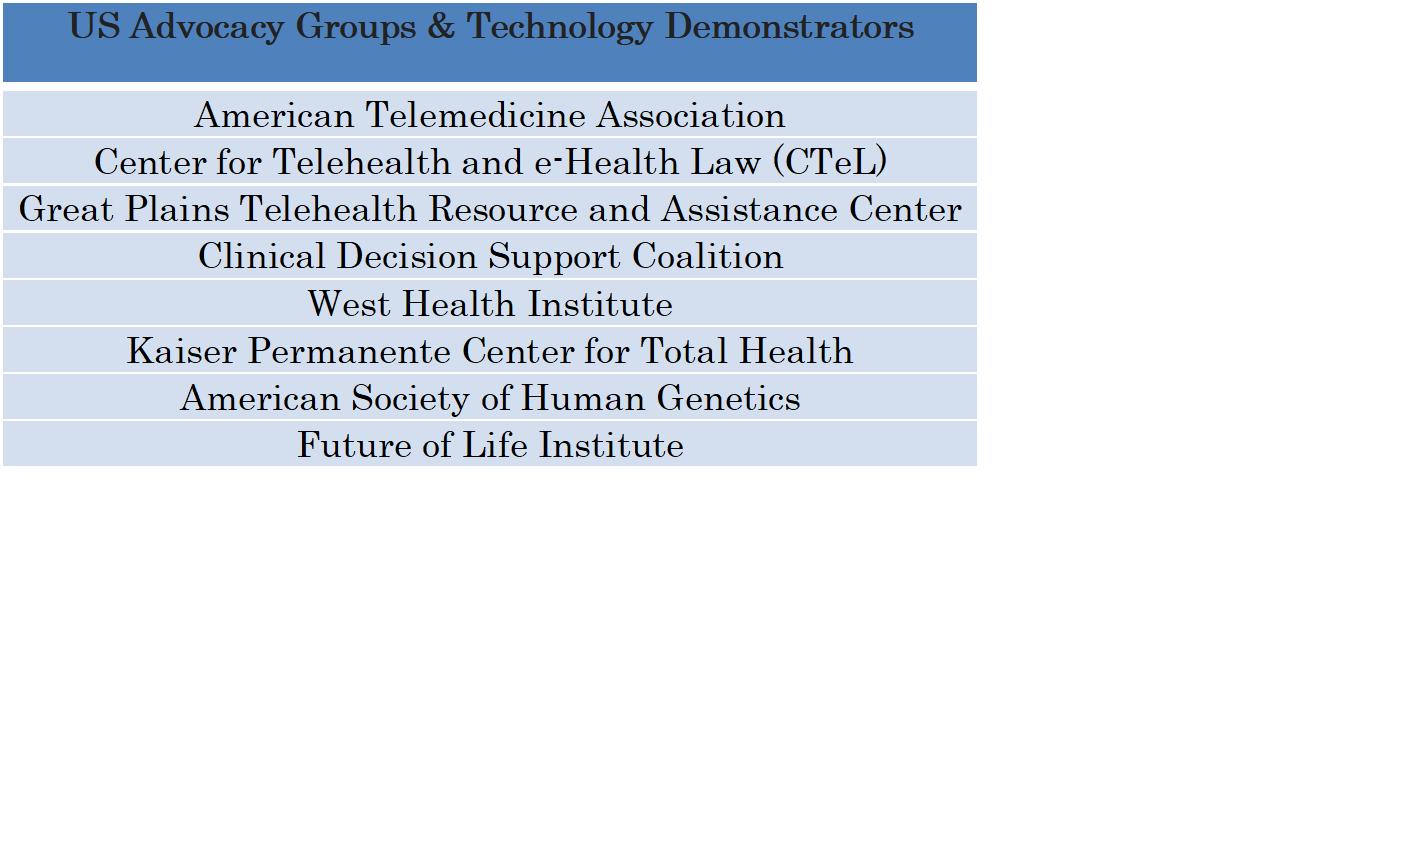 US Advocacy Groups